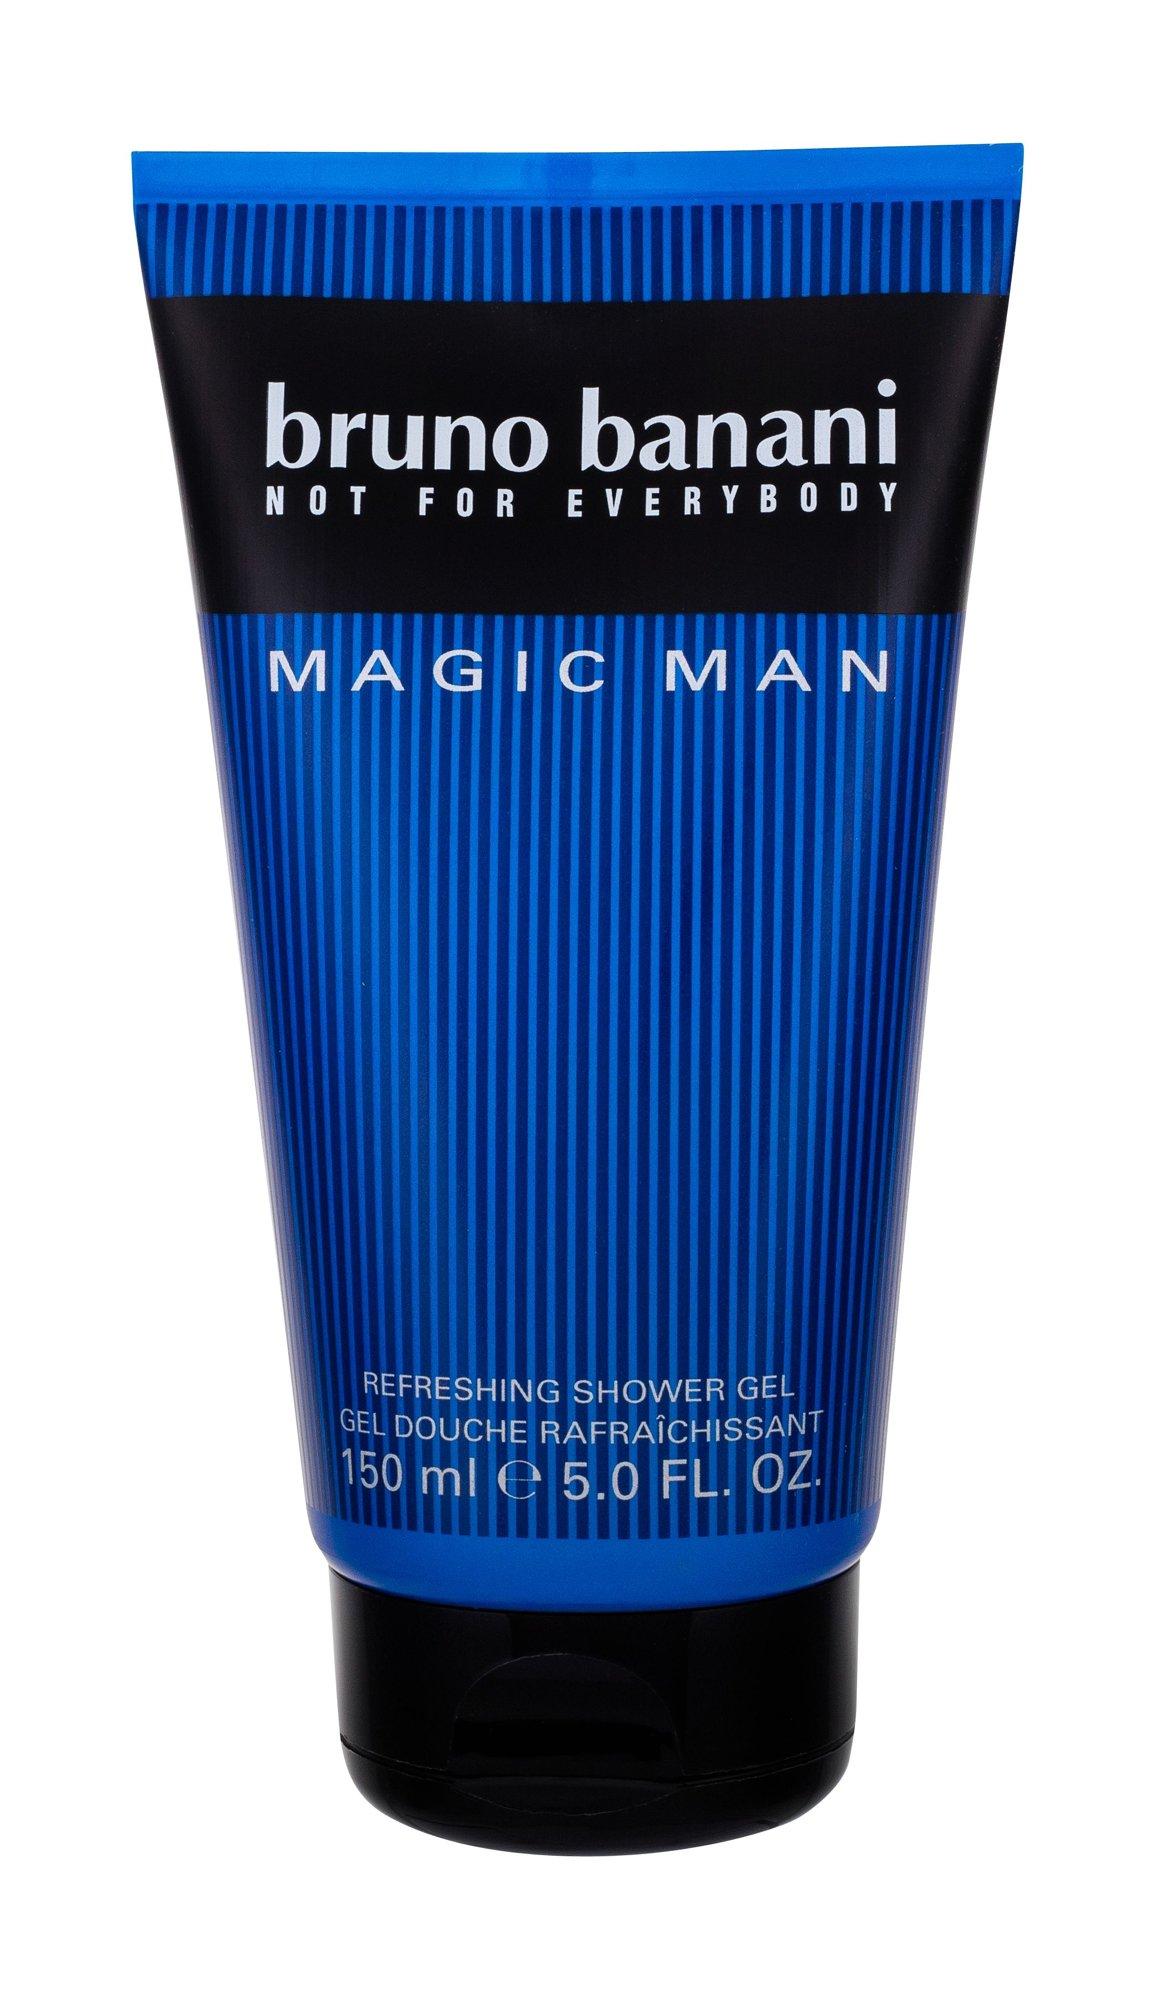 Bruno Banani Magic Man, tusfürdő gél 150ml